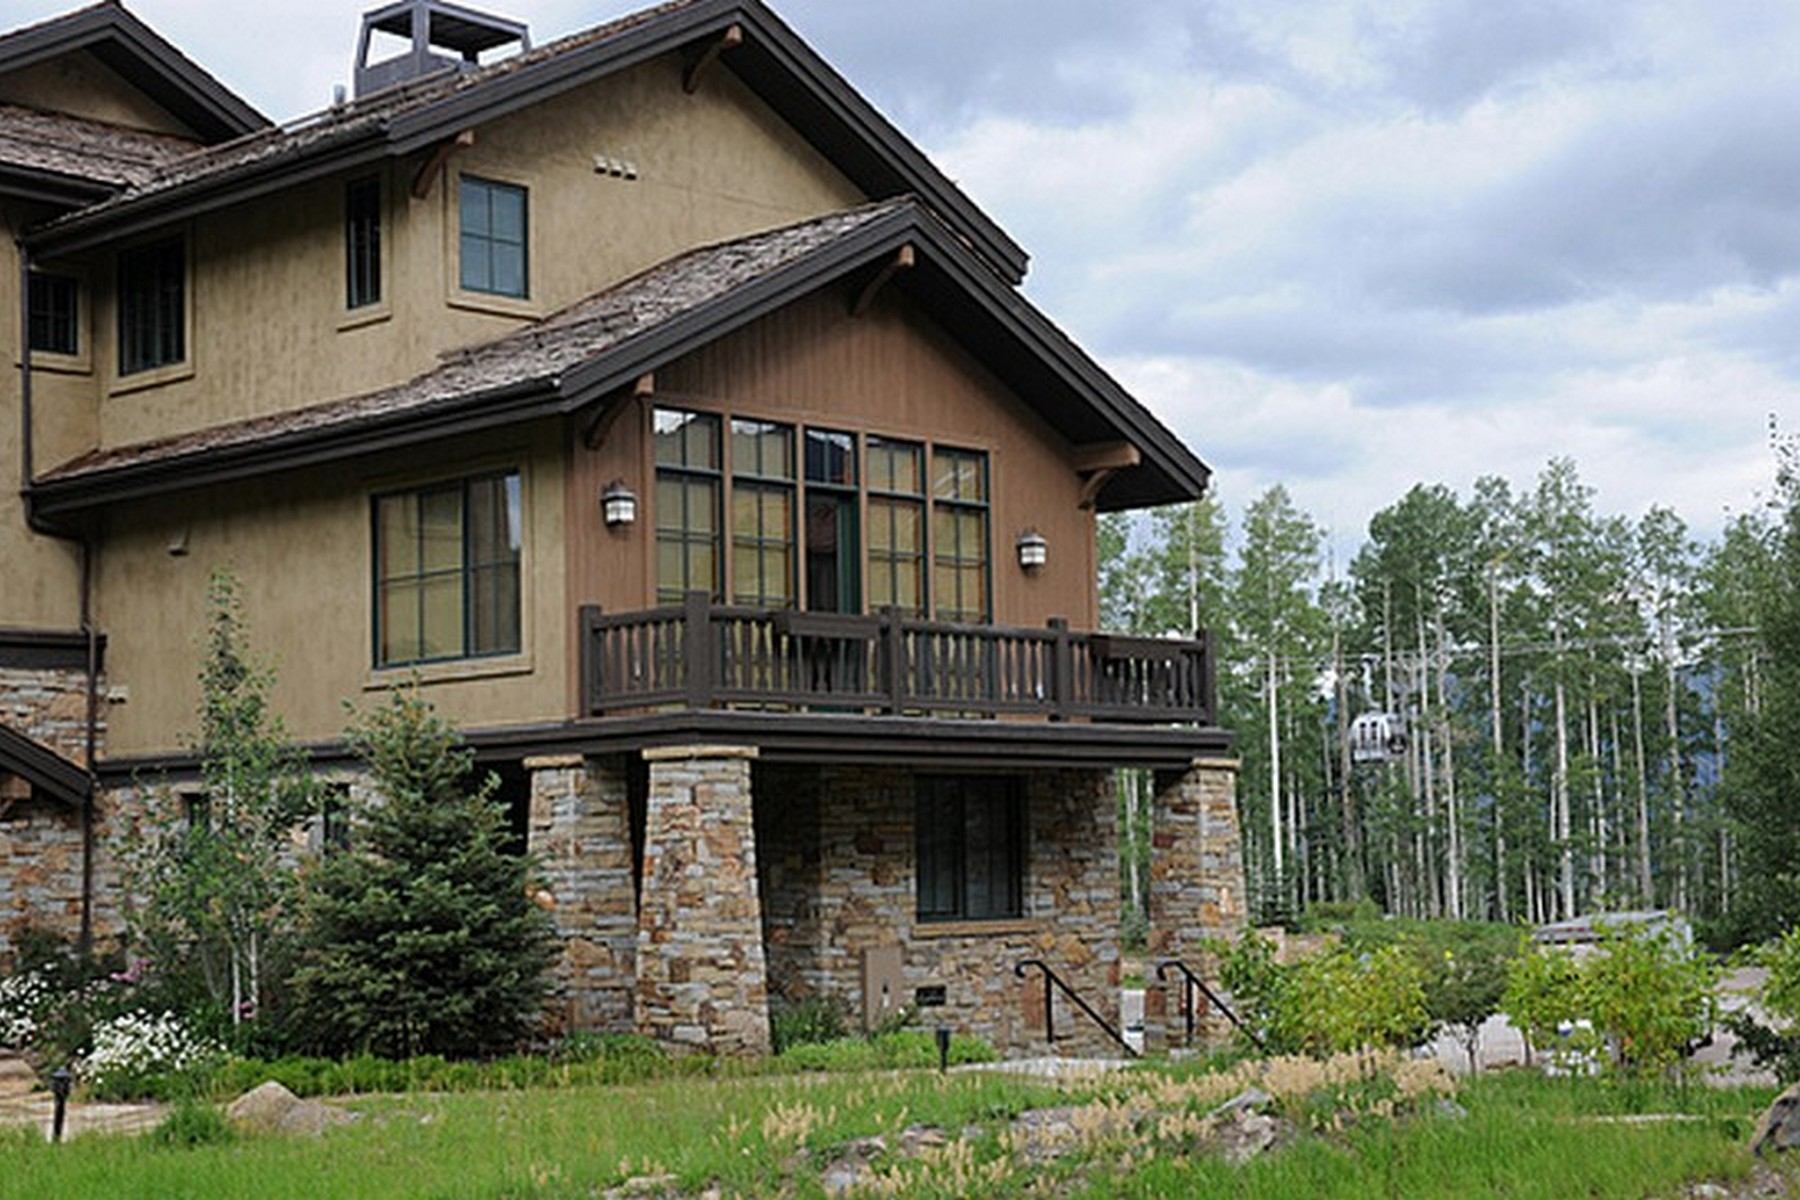 Condominium for Sale at Belvedere Park, Unit 4 112 Lost Creek Lane Mountain Village Mountain Village, Telluride, Colorado 81435 United States